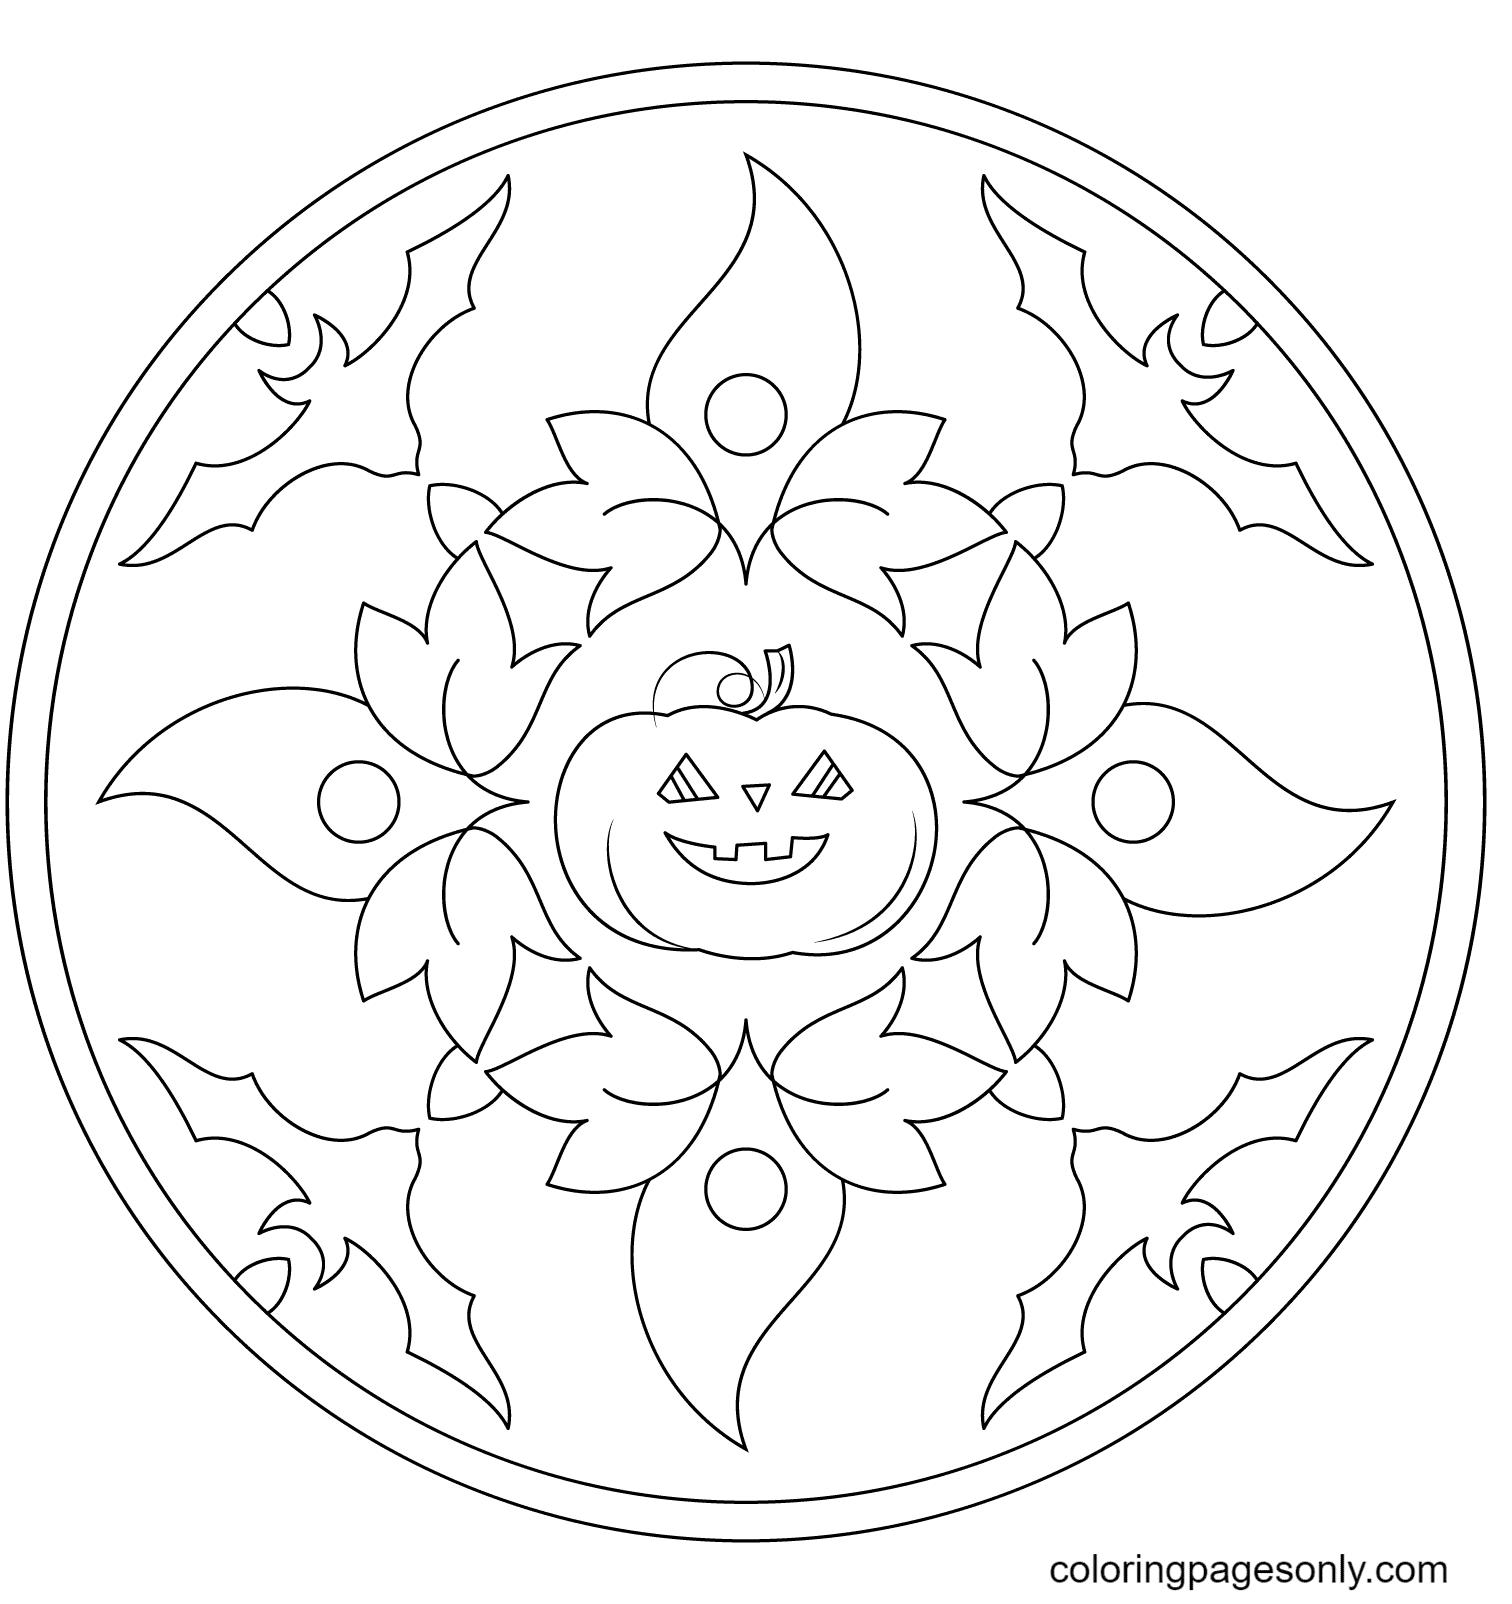 Halloween Mandala with Bats and Pumpkin Coloring Page